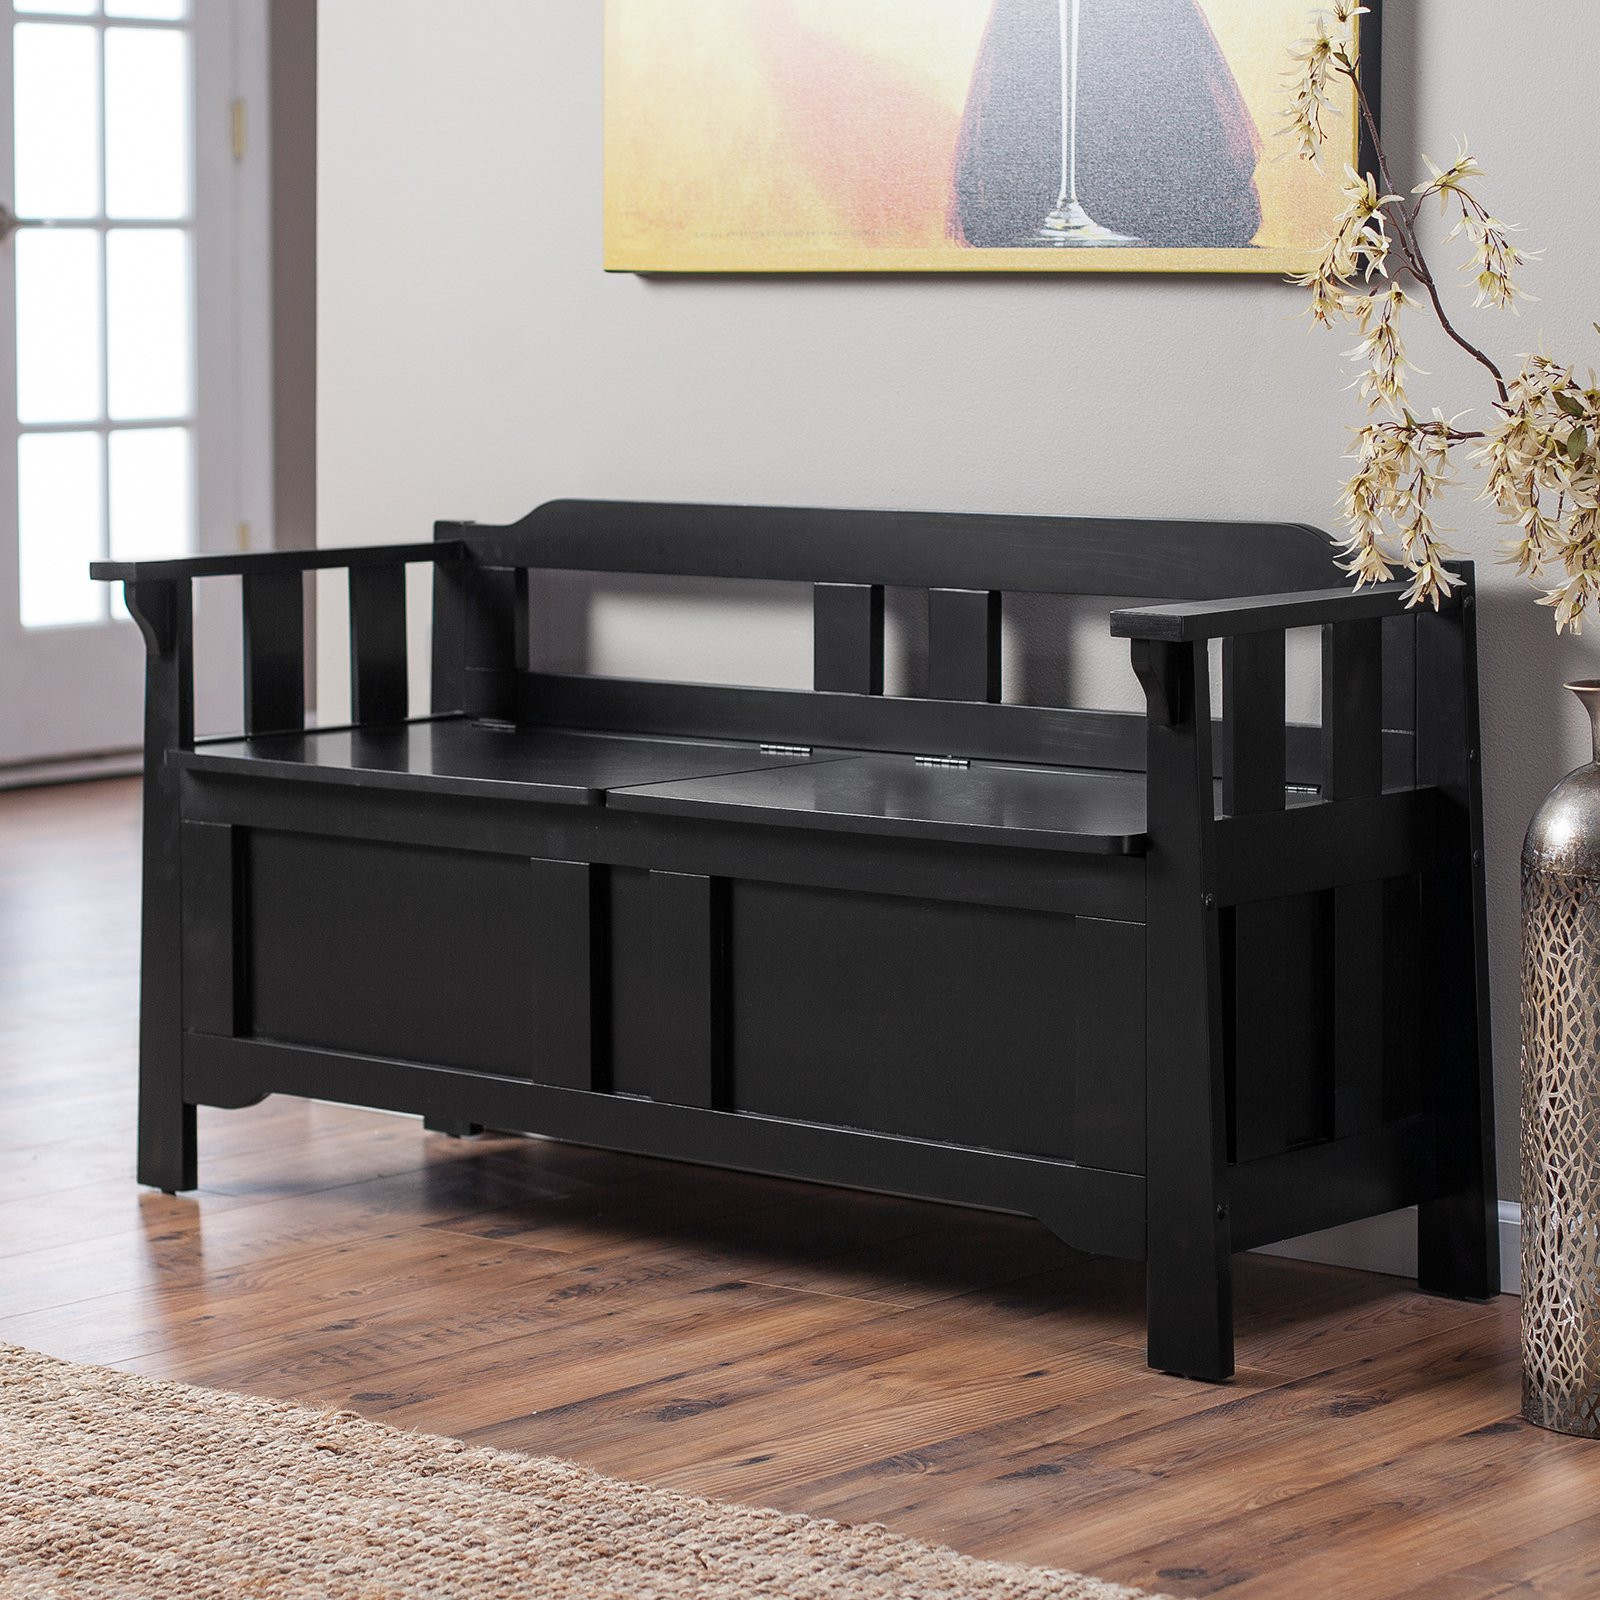 Black Bench with Storage Luxury Parker Storage Bench Black Bedroom Benches at Hayneedle